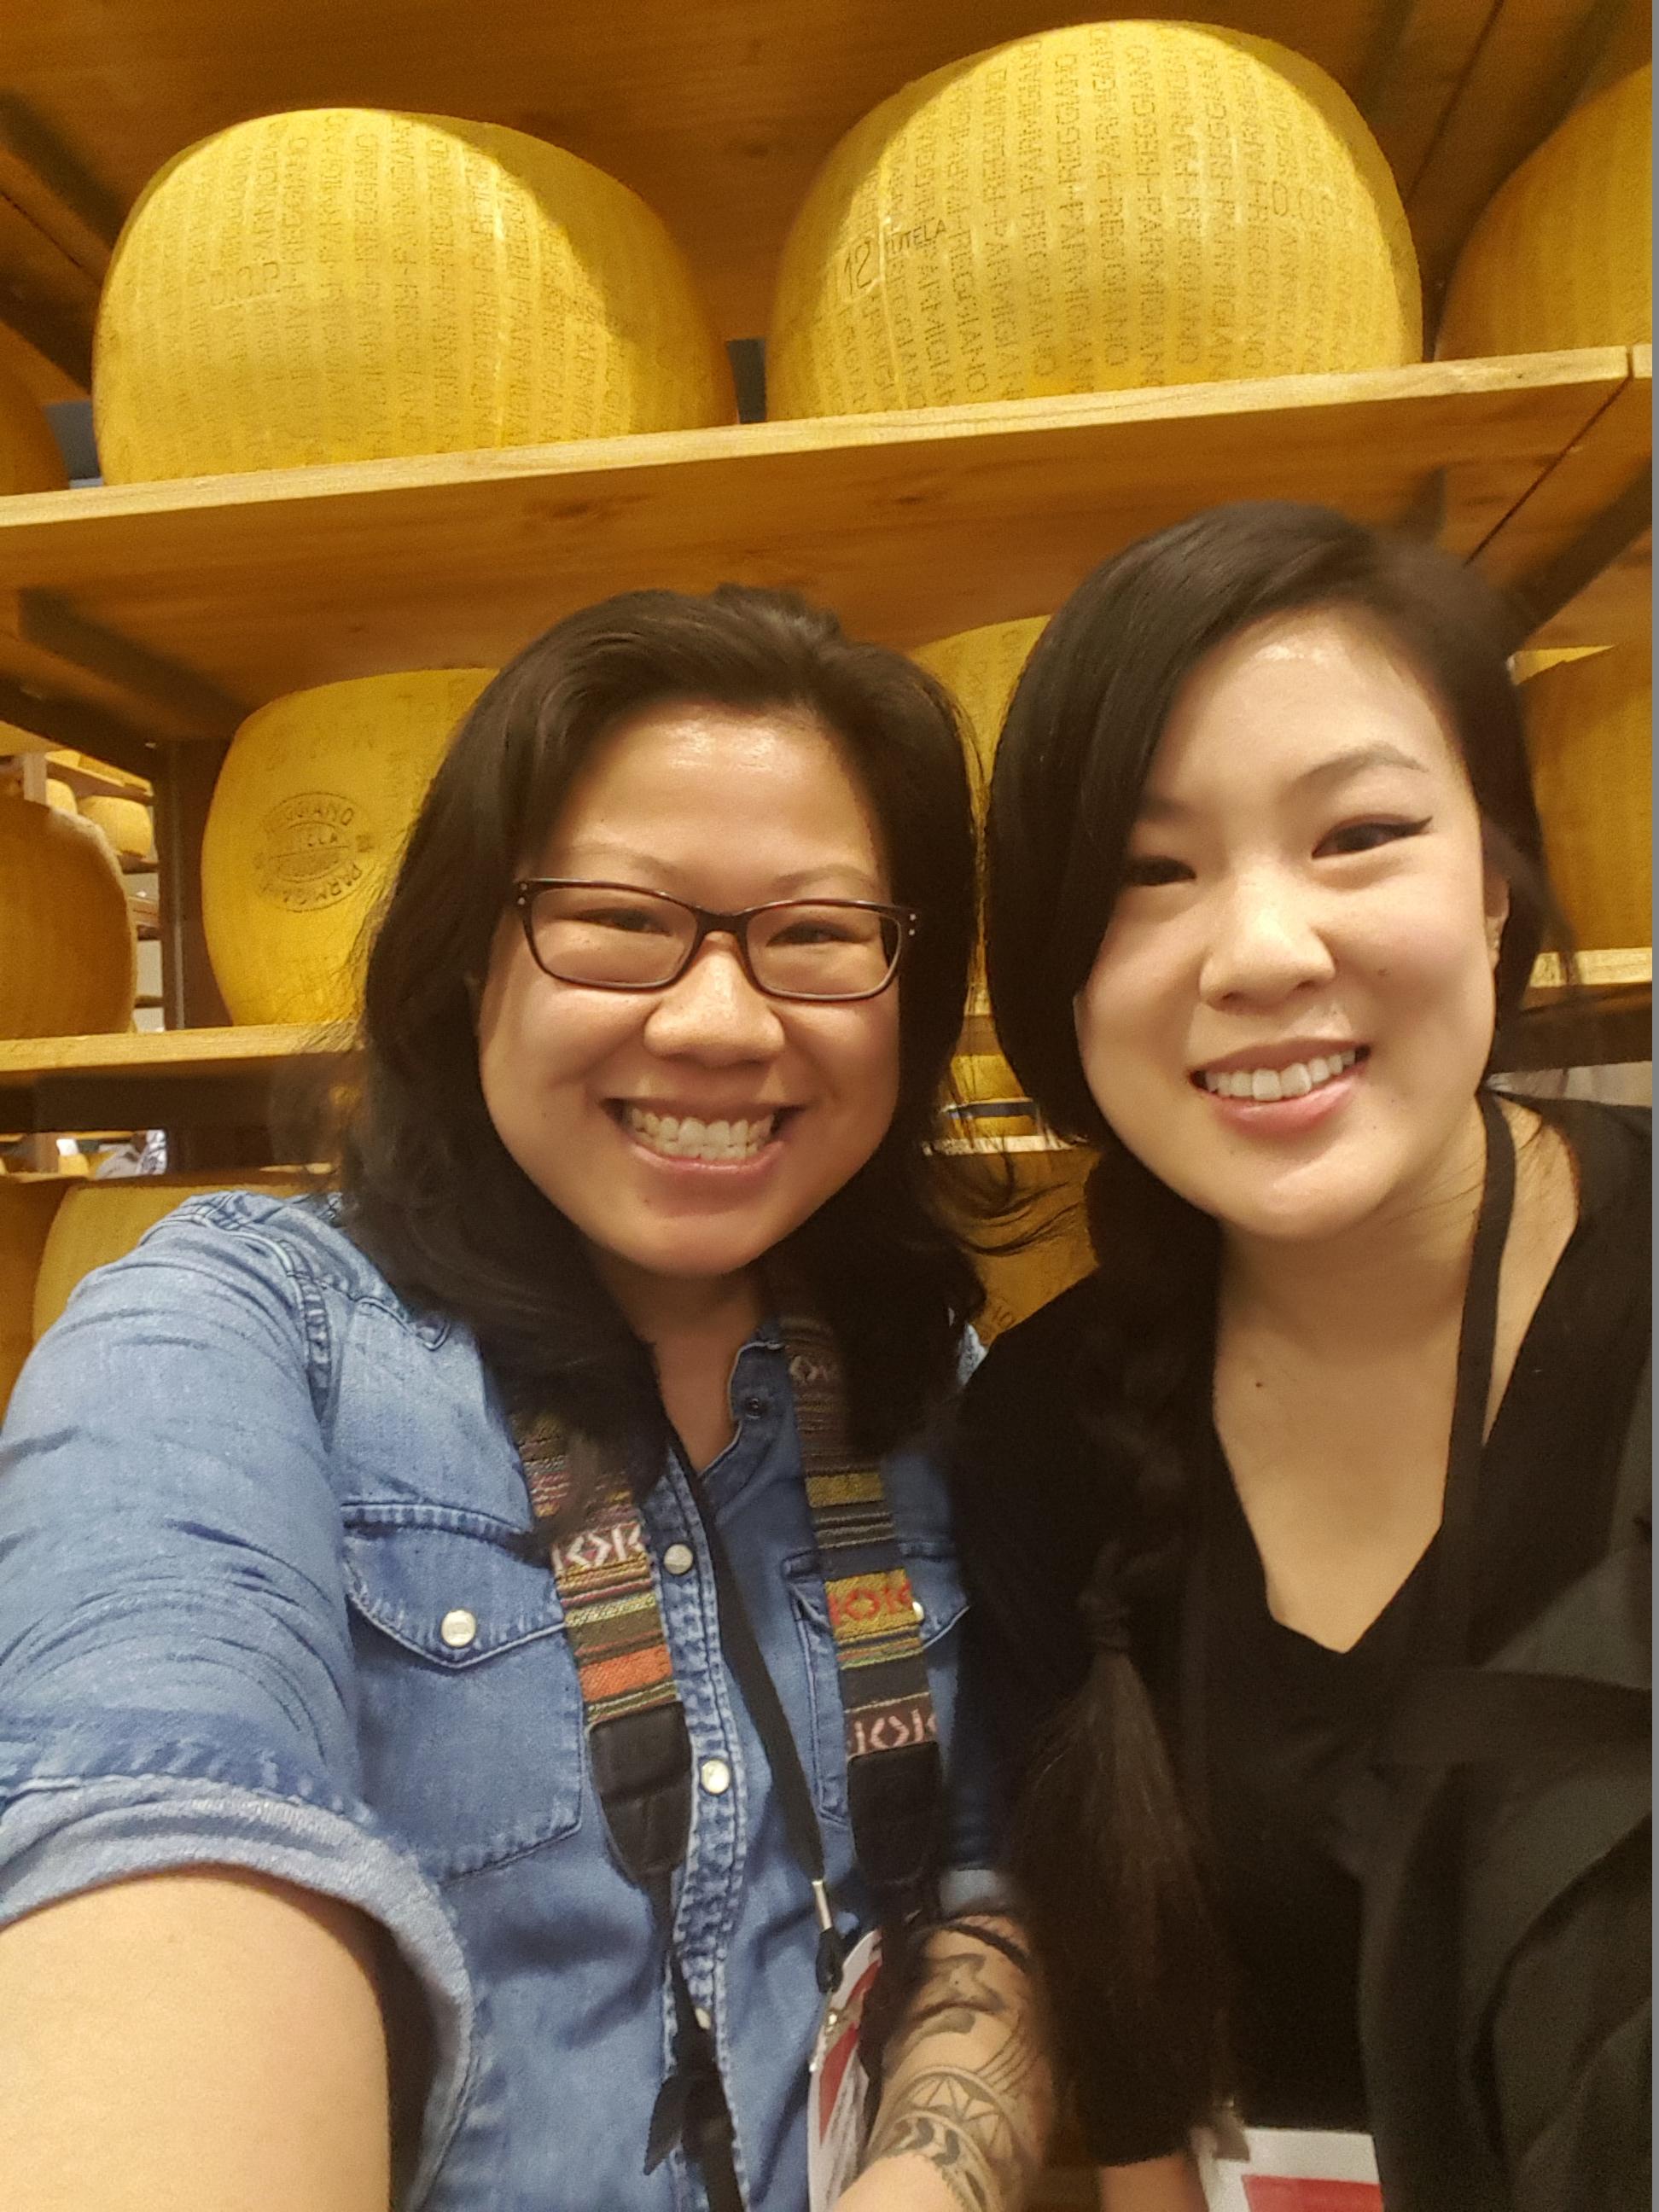 Brenda (from  Bites & Bourbon ) and I